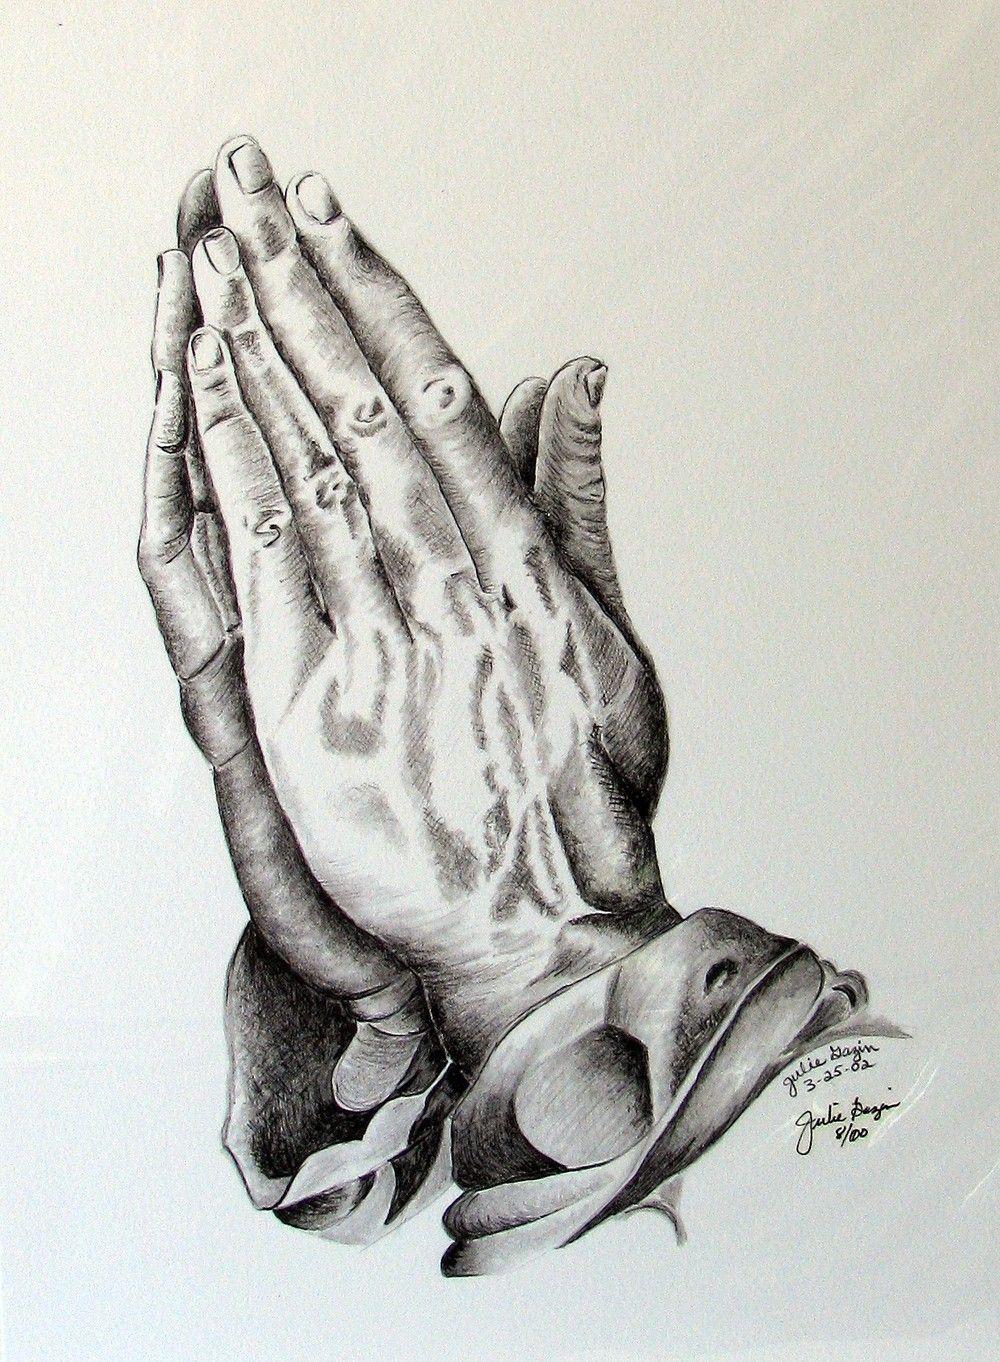 Prayer hands tattoos designs - Pix For Jesus Praying Hands Drawing